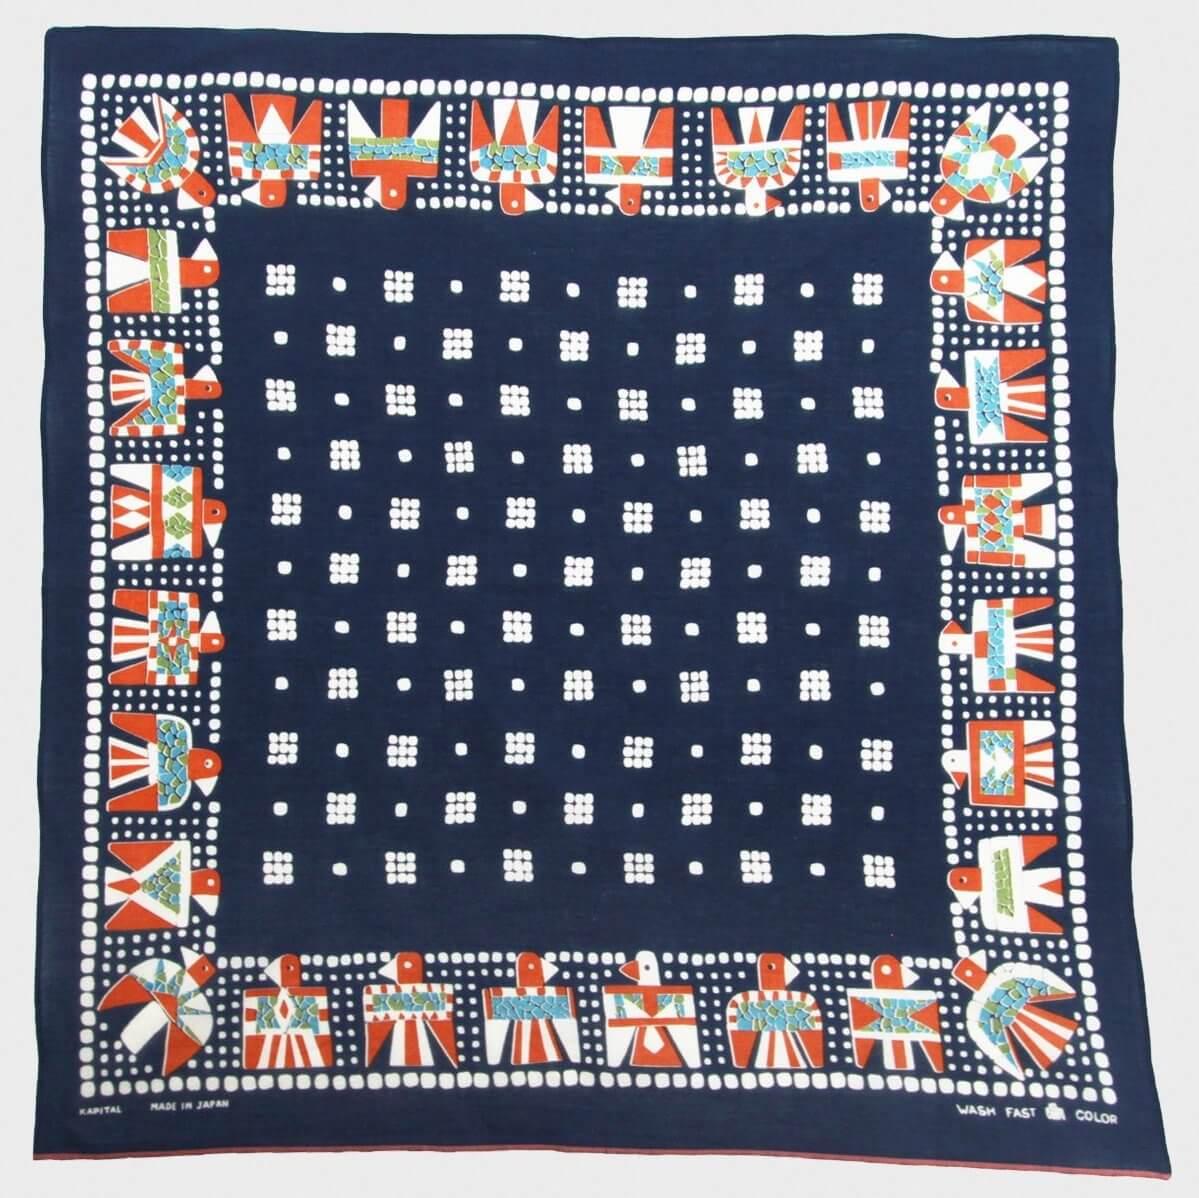 kapital thunderbird bandana with dice pattern